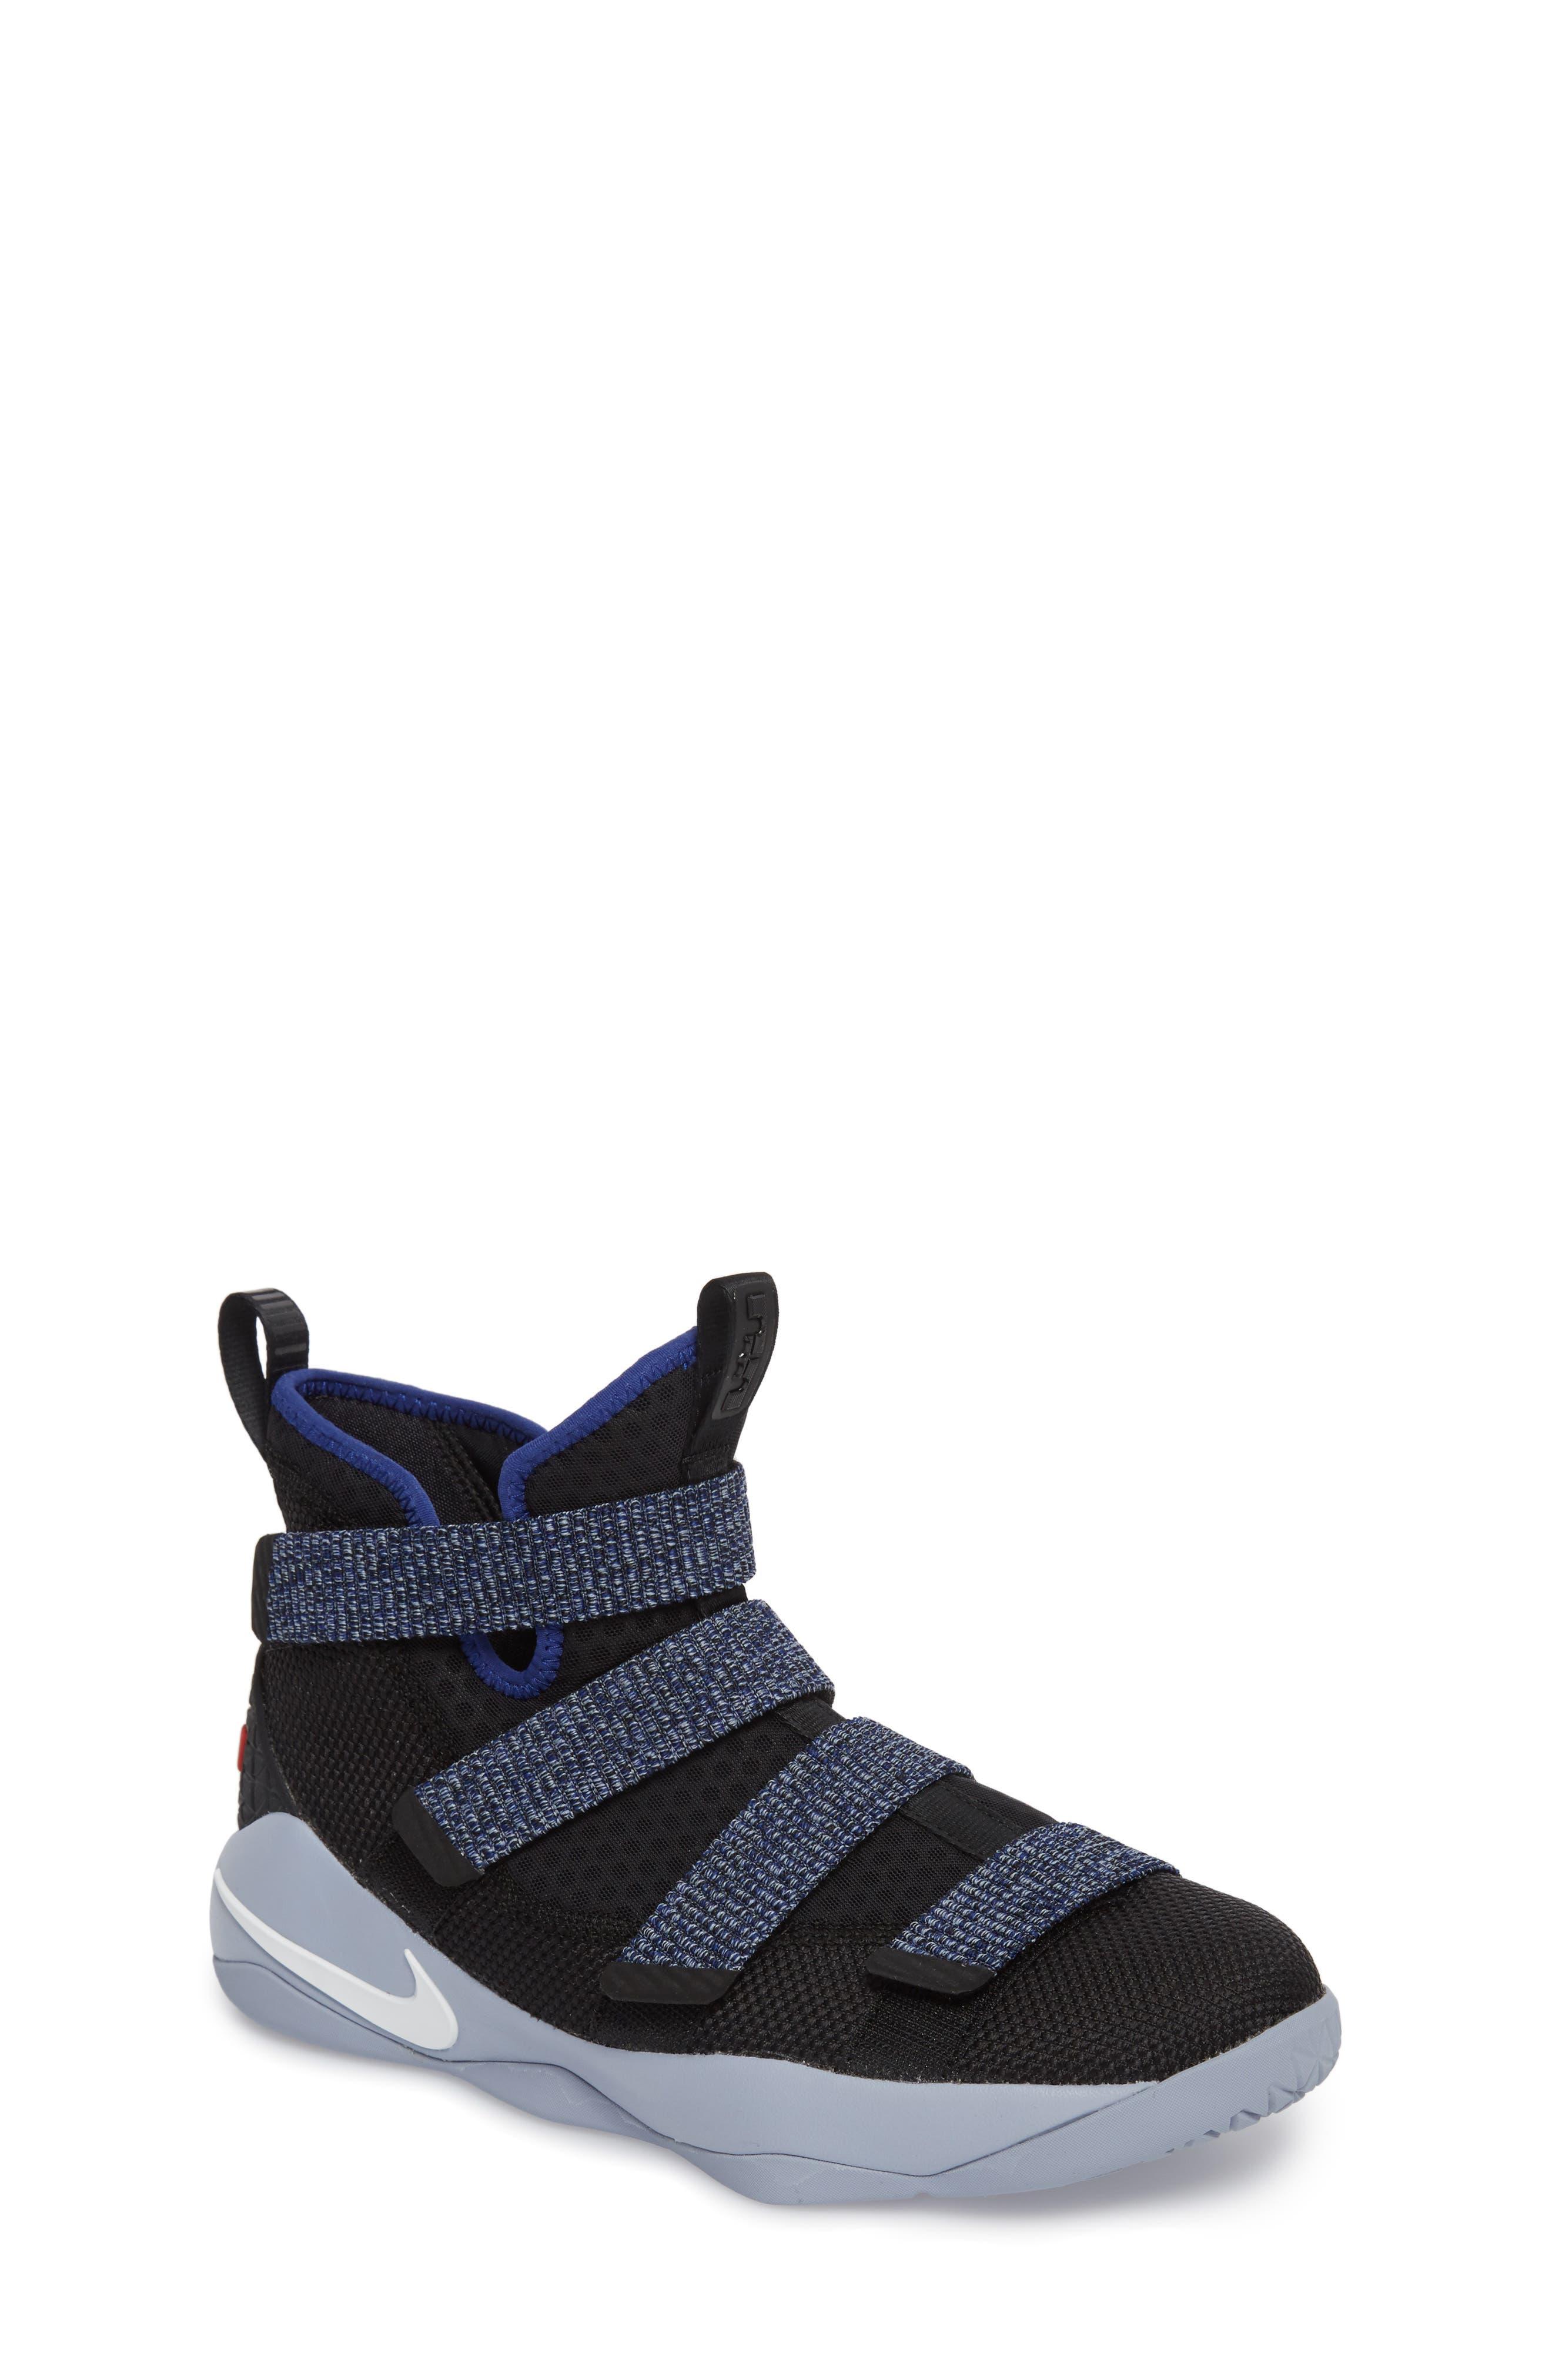 NIKE LeBron Soldier XI Basketball Shoe, Main, color, 005